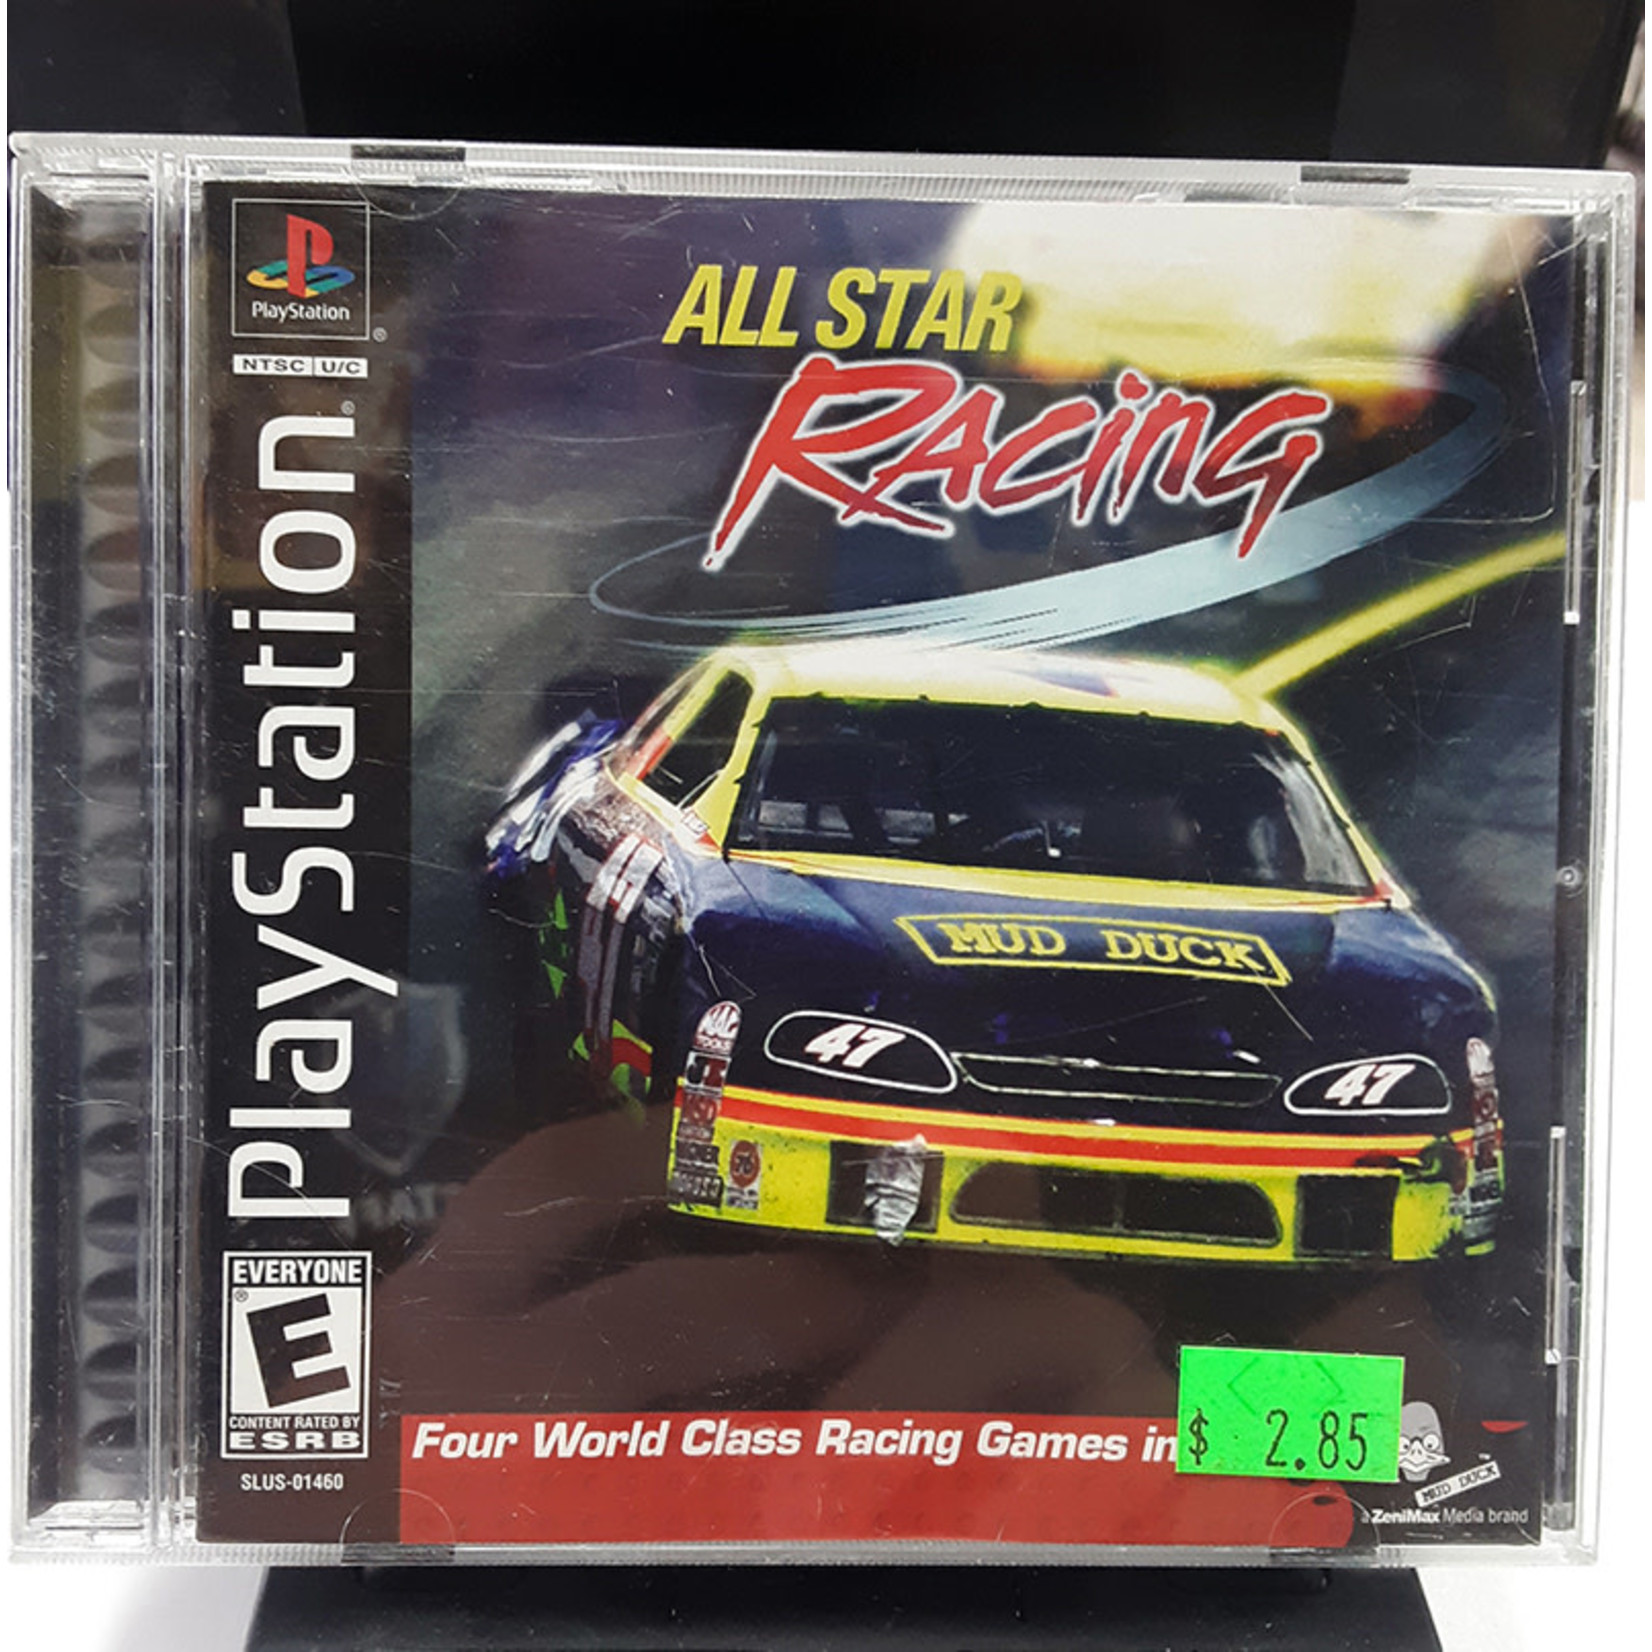 ps1u-All Star Racing